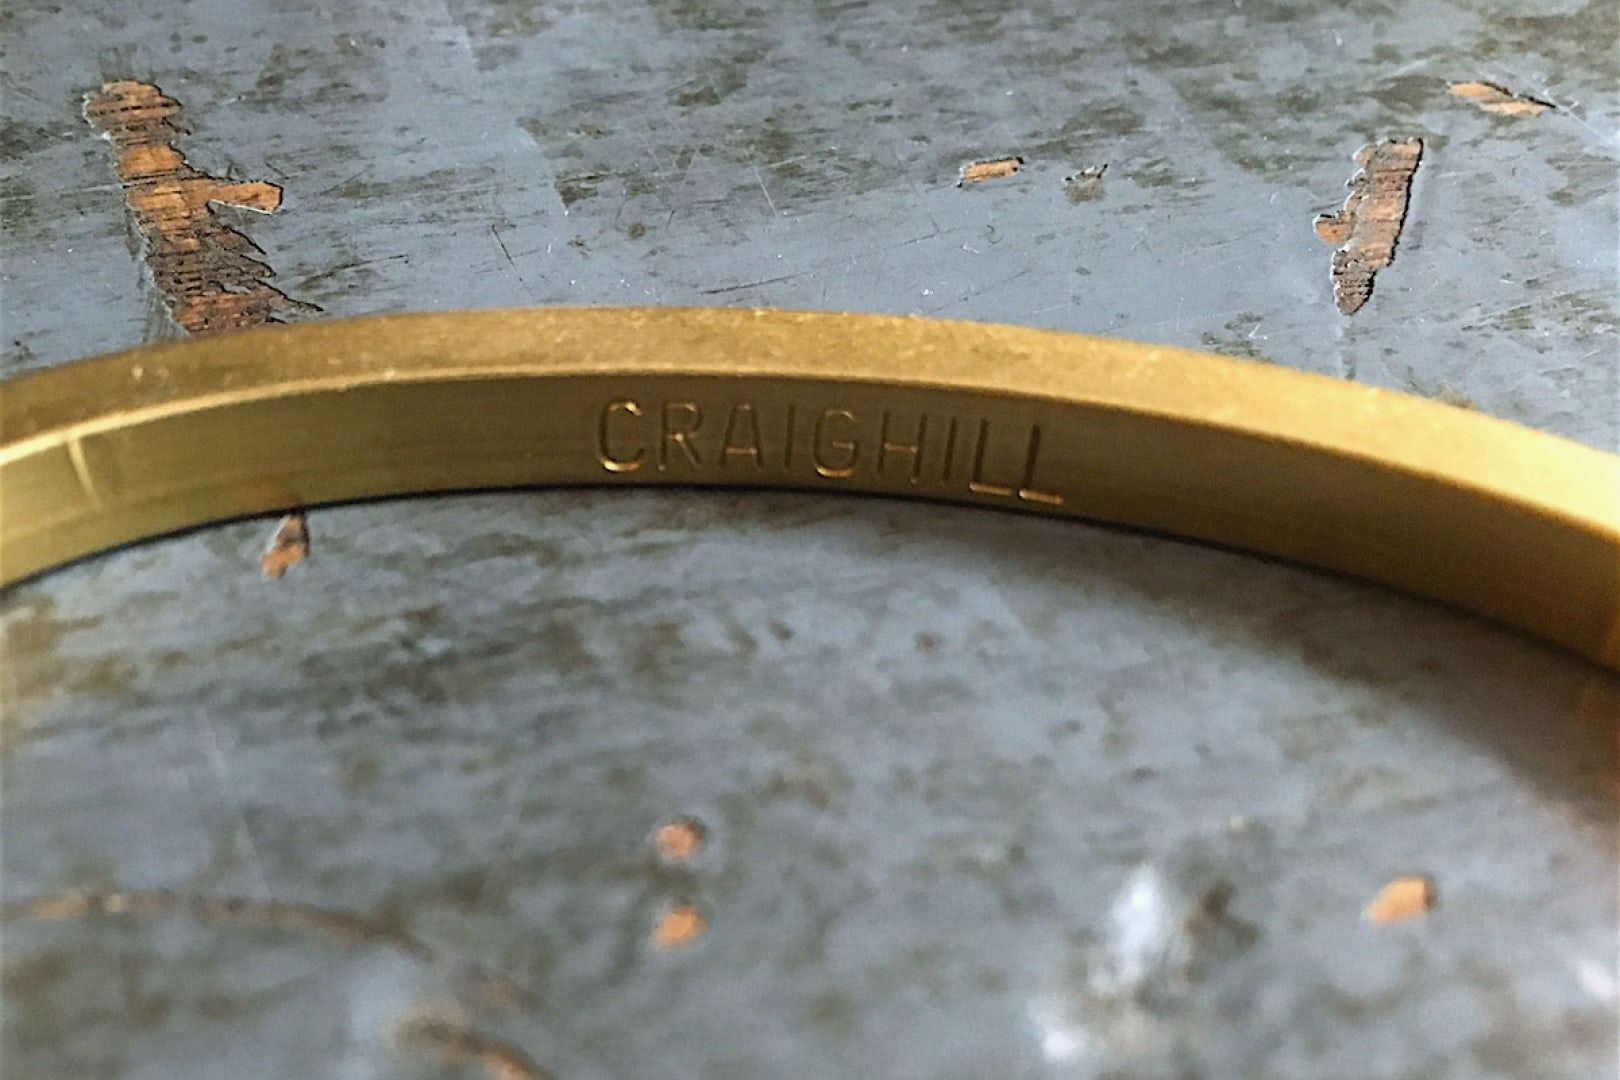 Craighill Uniform Square Cuff Brass